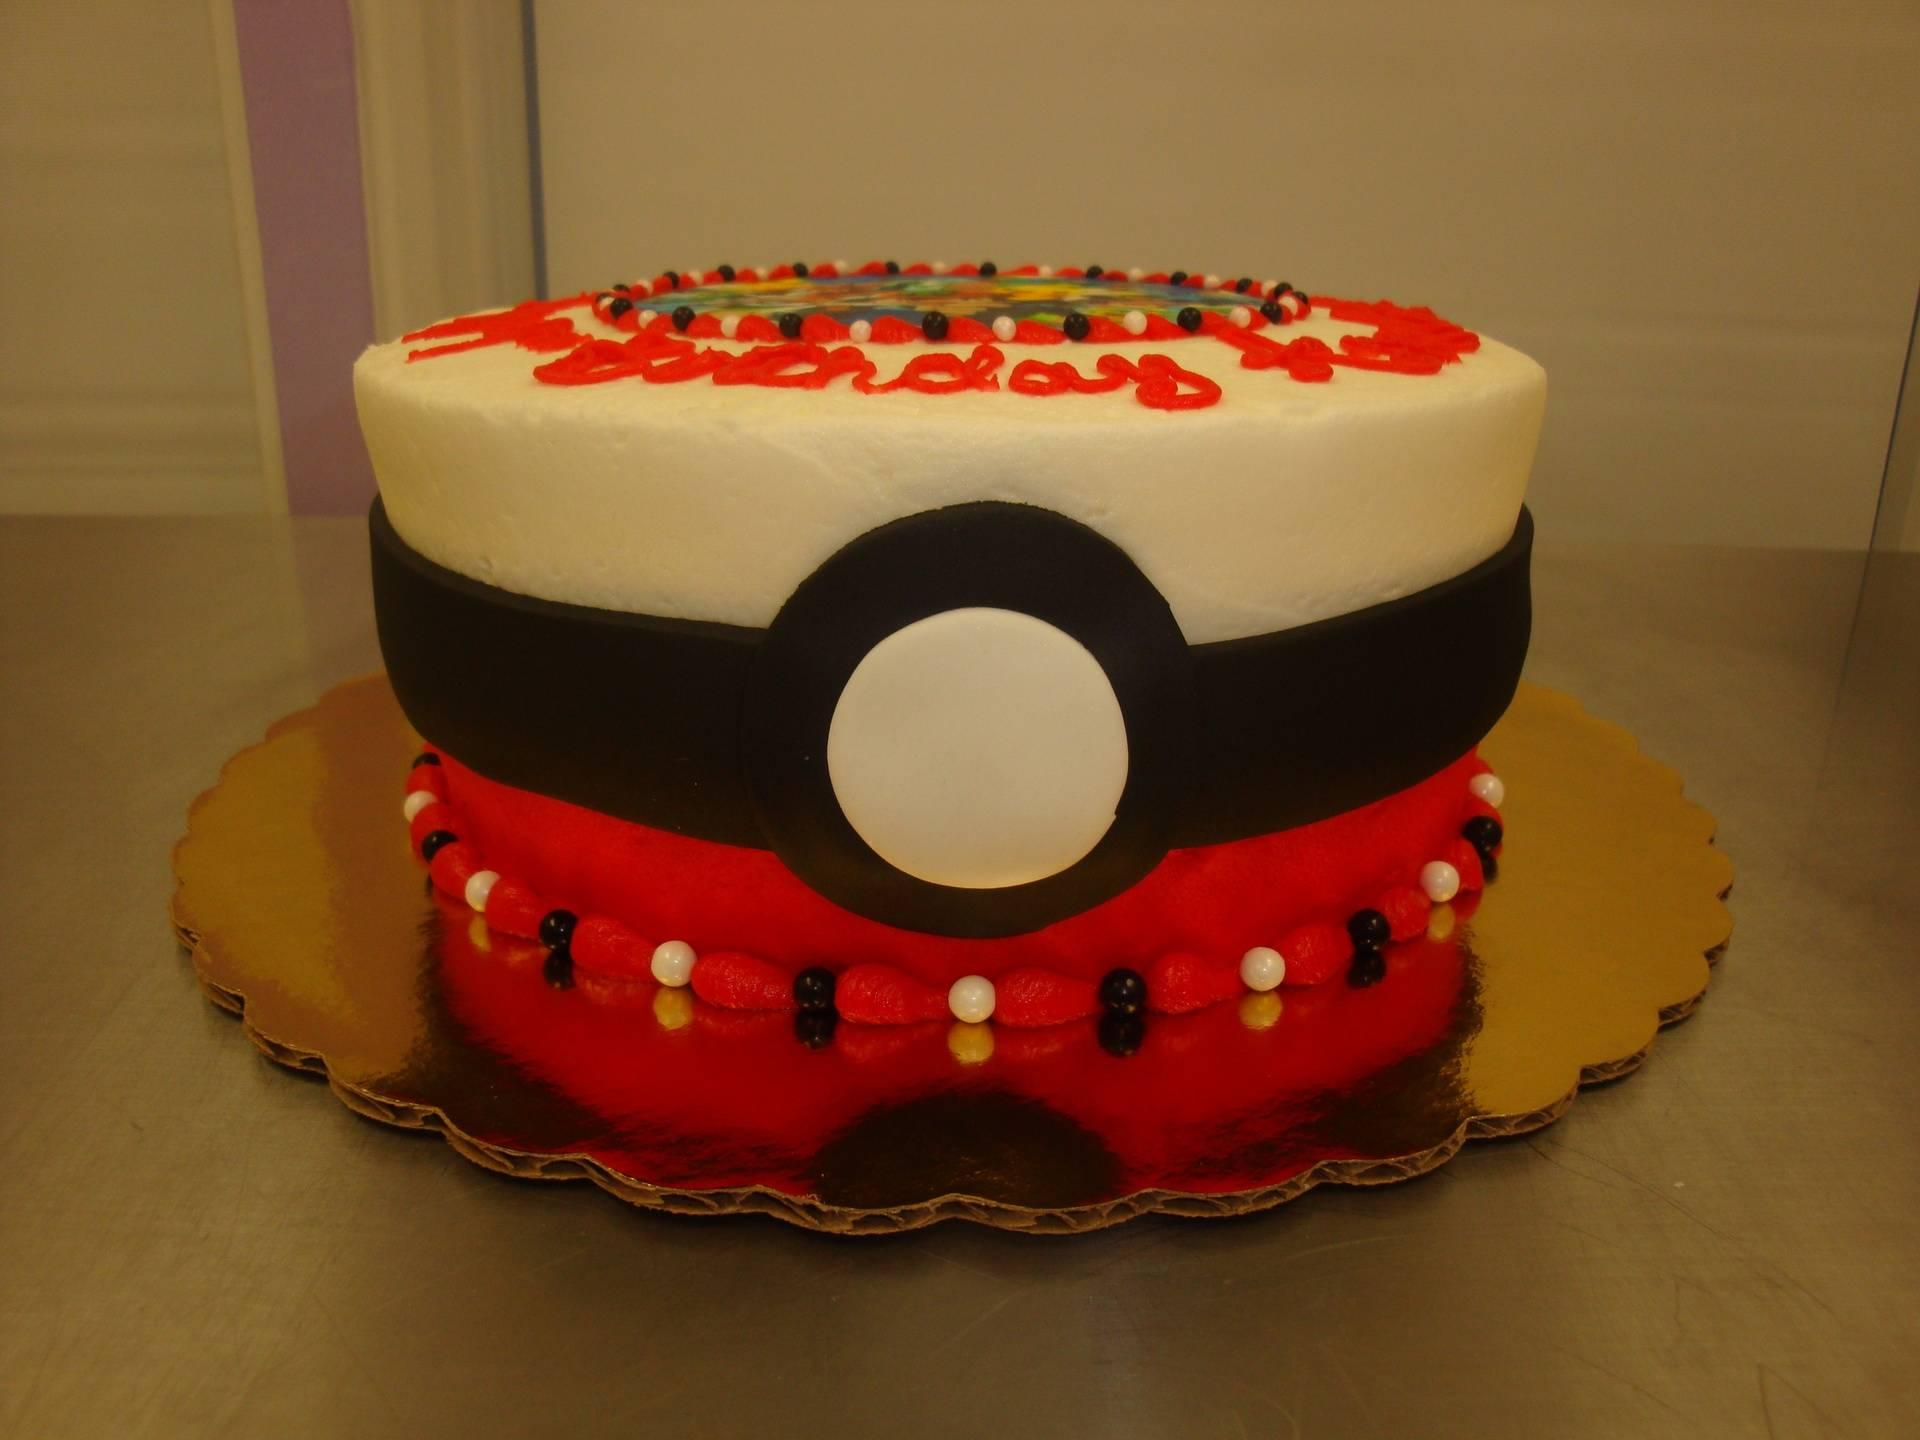 15 serving poke ball photo decal cake $75